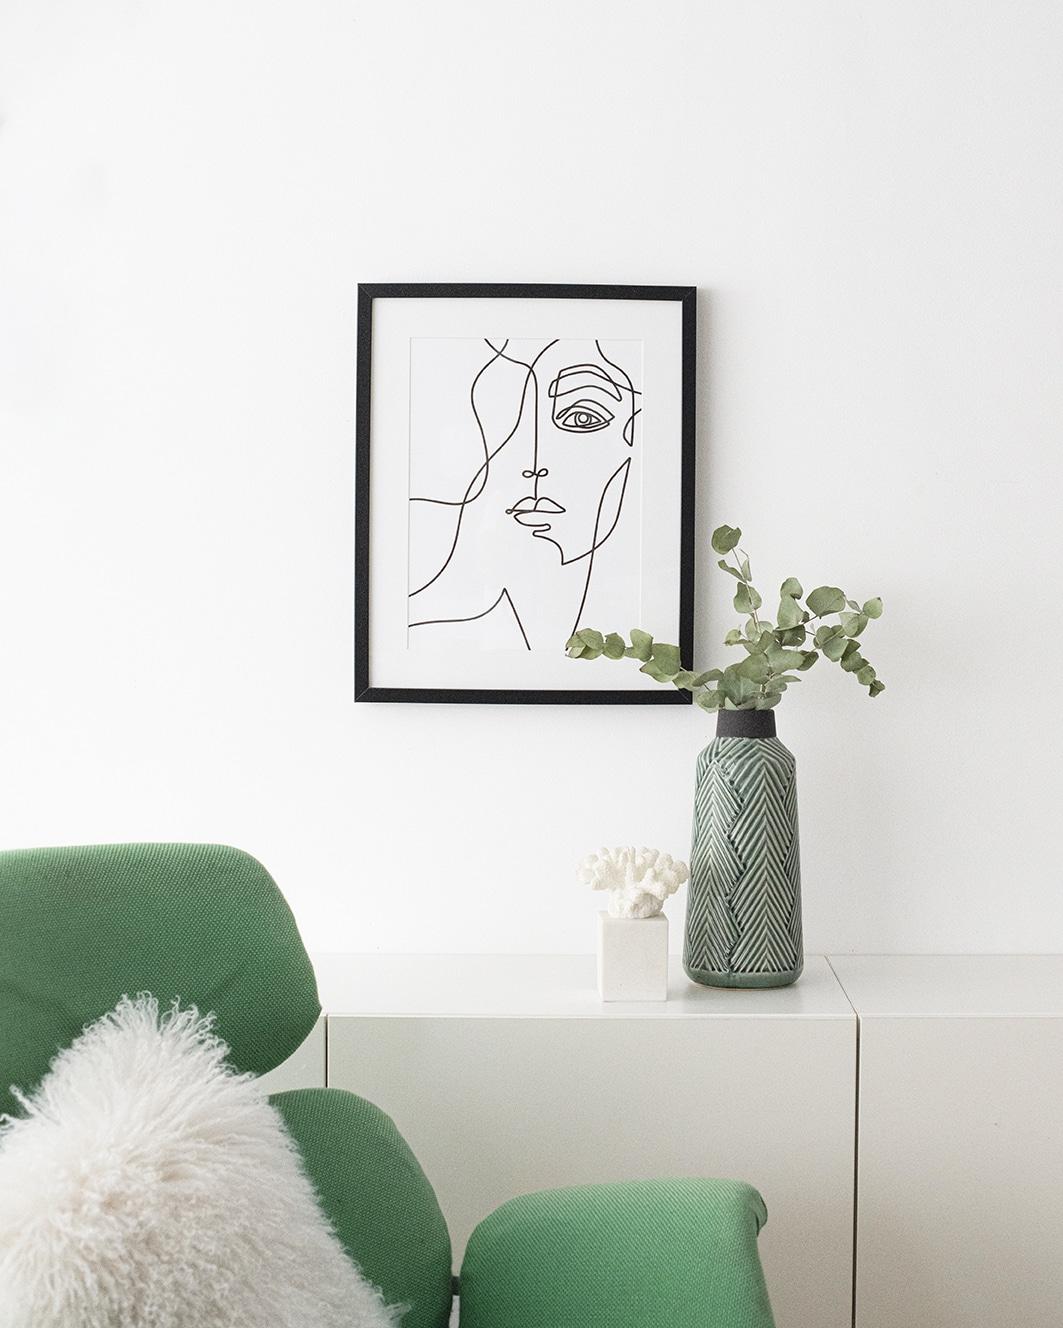 Drawing under frame